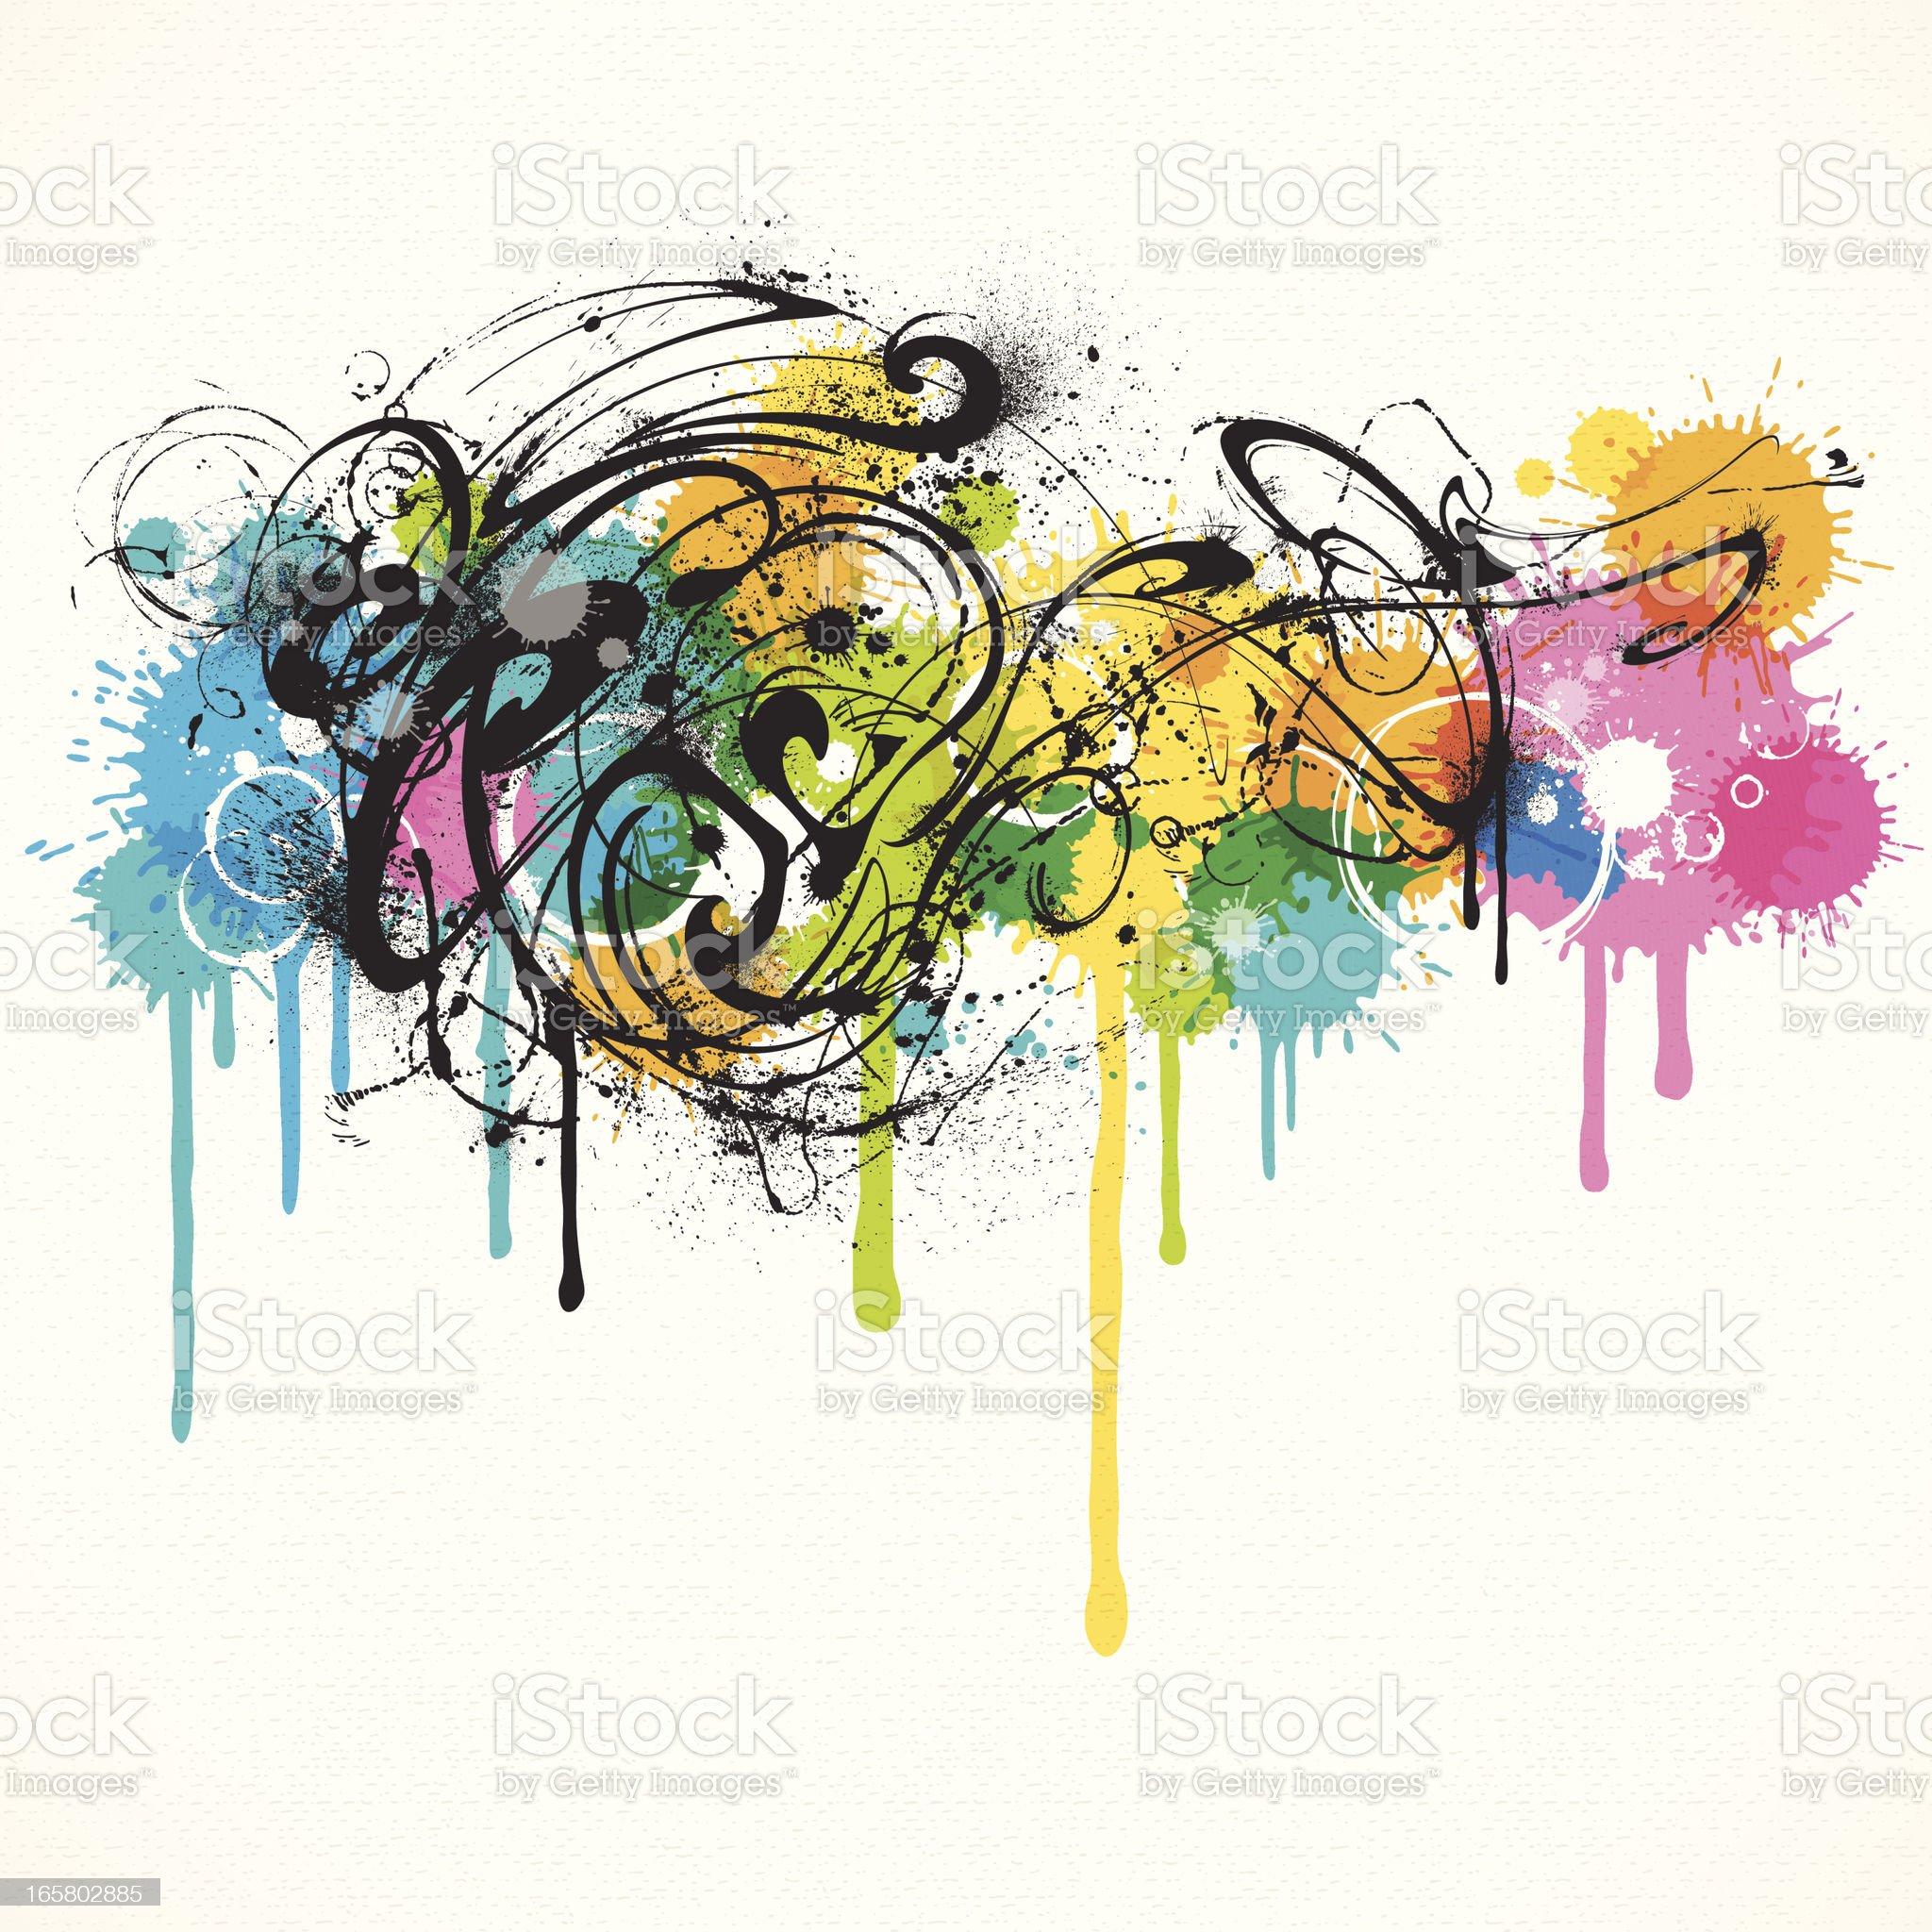 Grunge Swirls royalty-free stock vector art